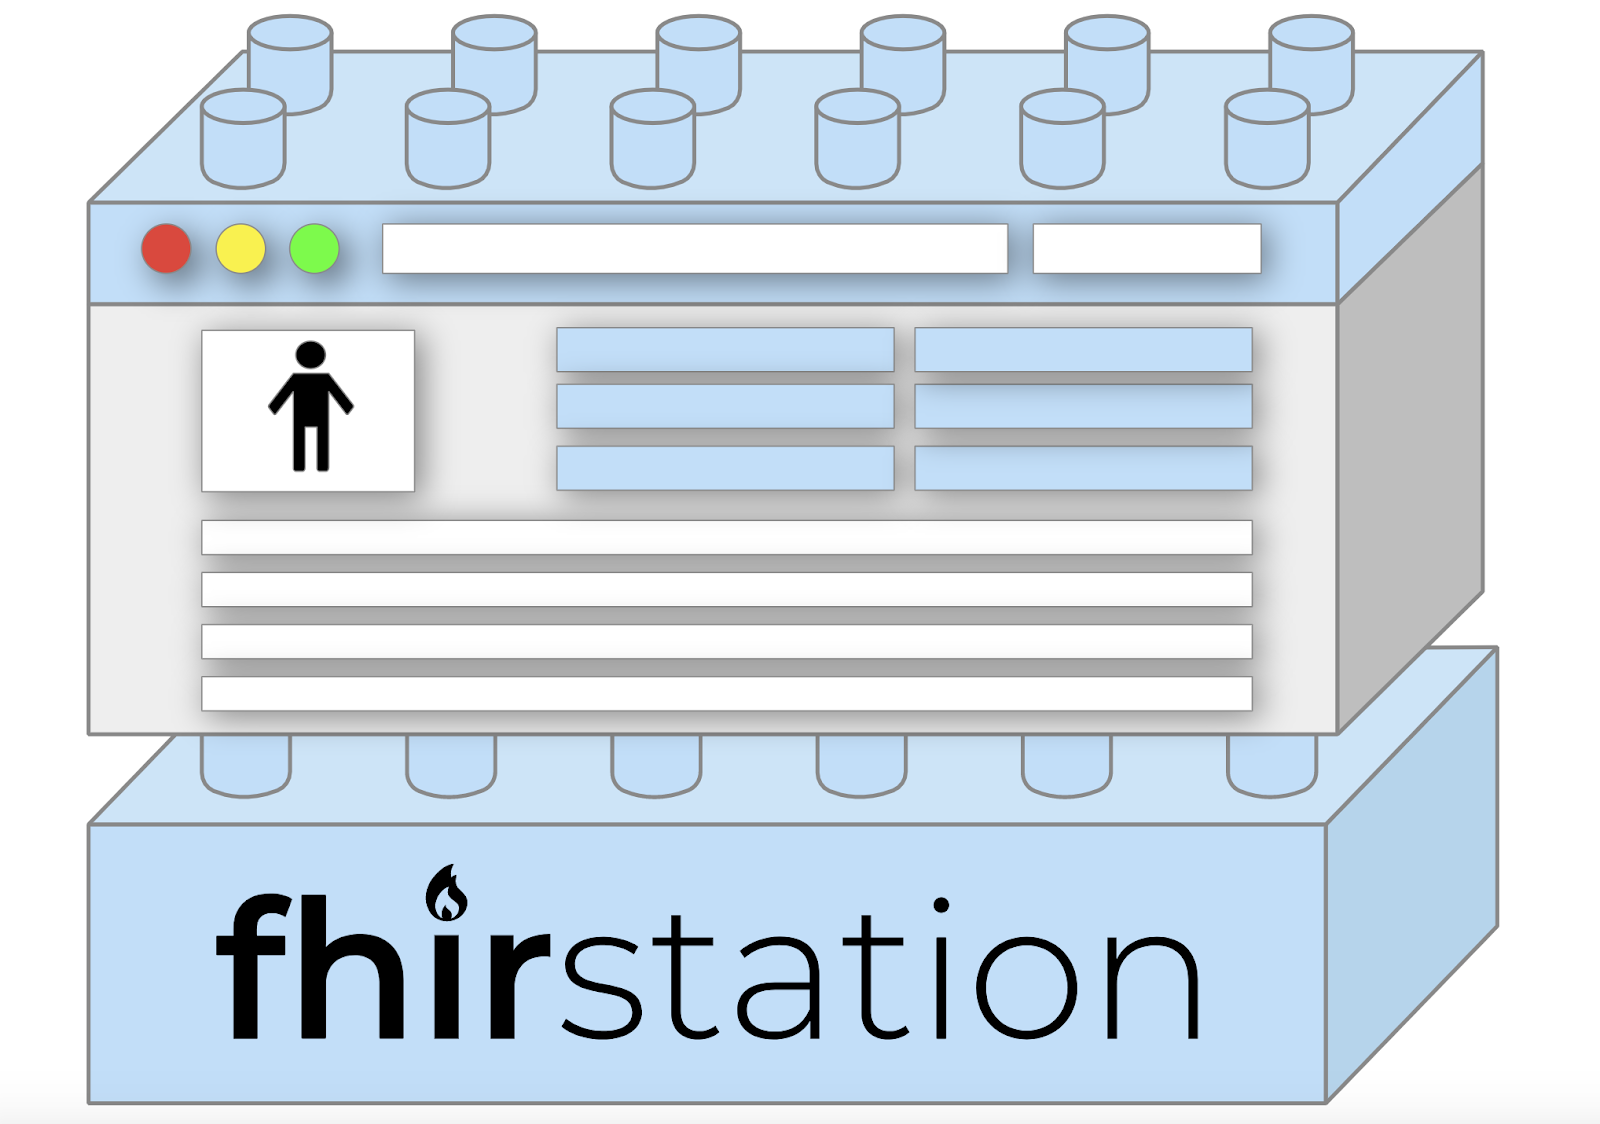 fhirstation by Iron Bridge